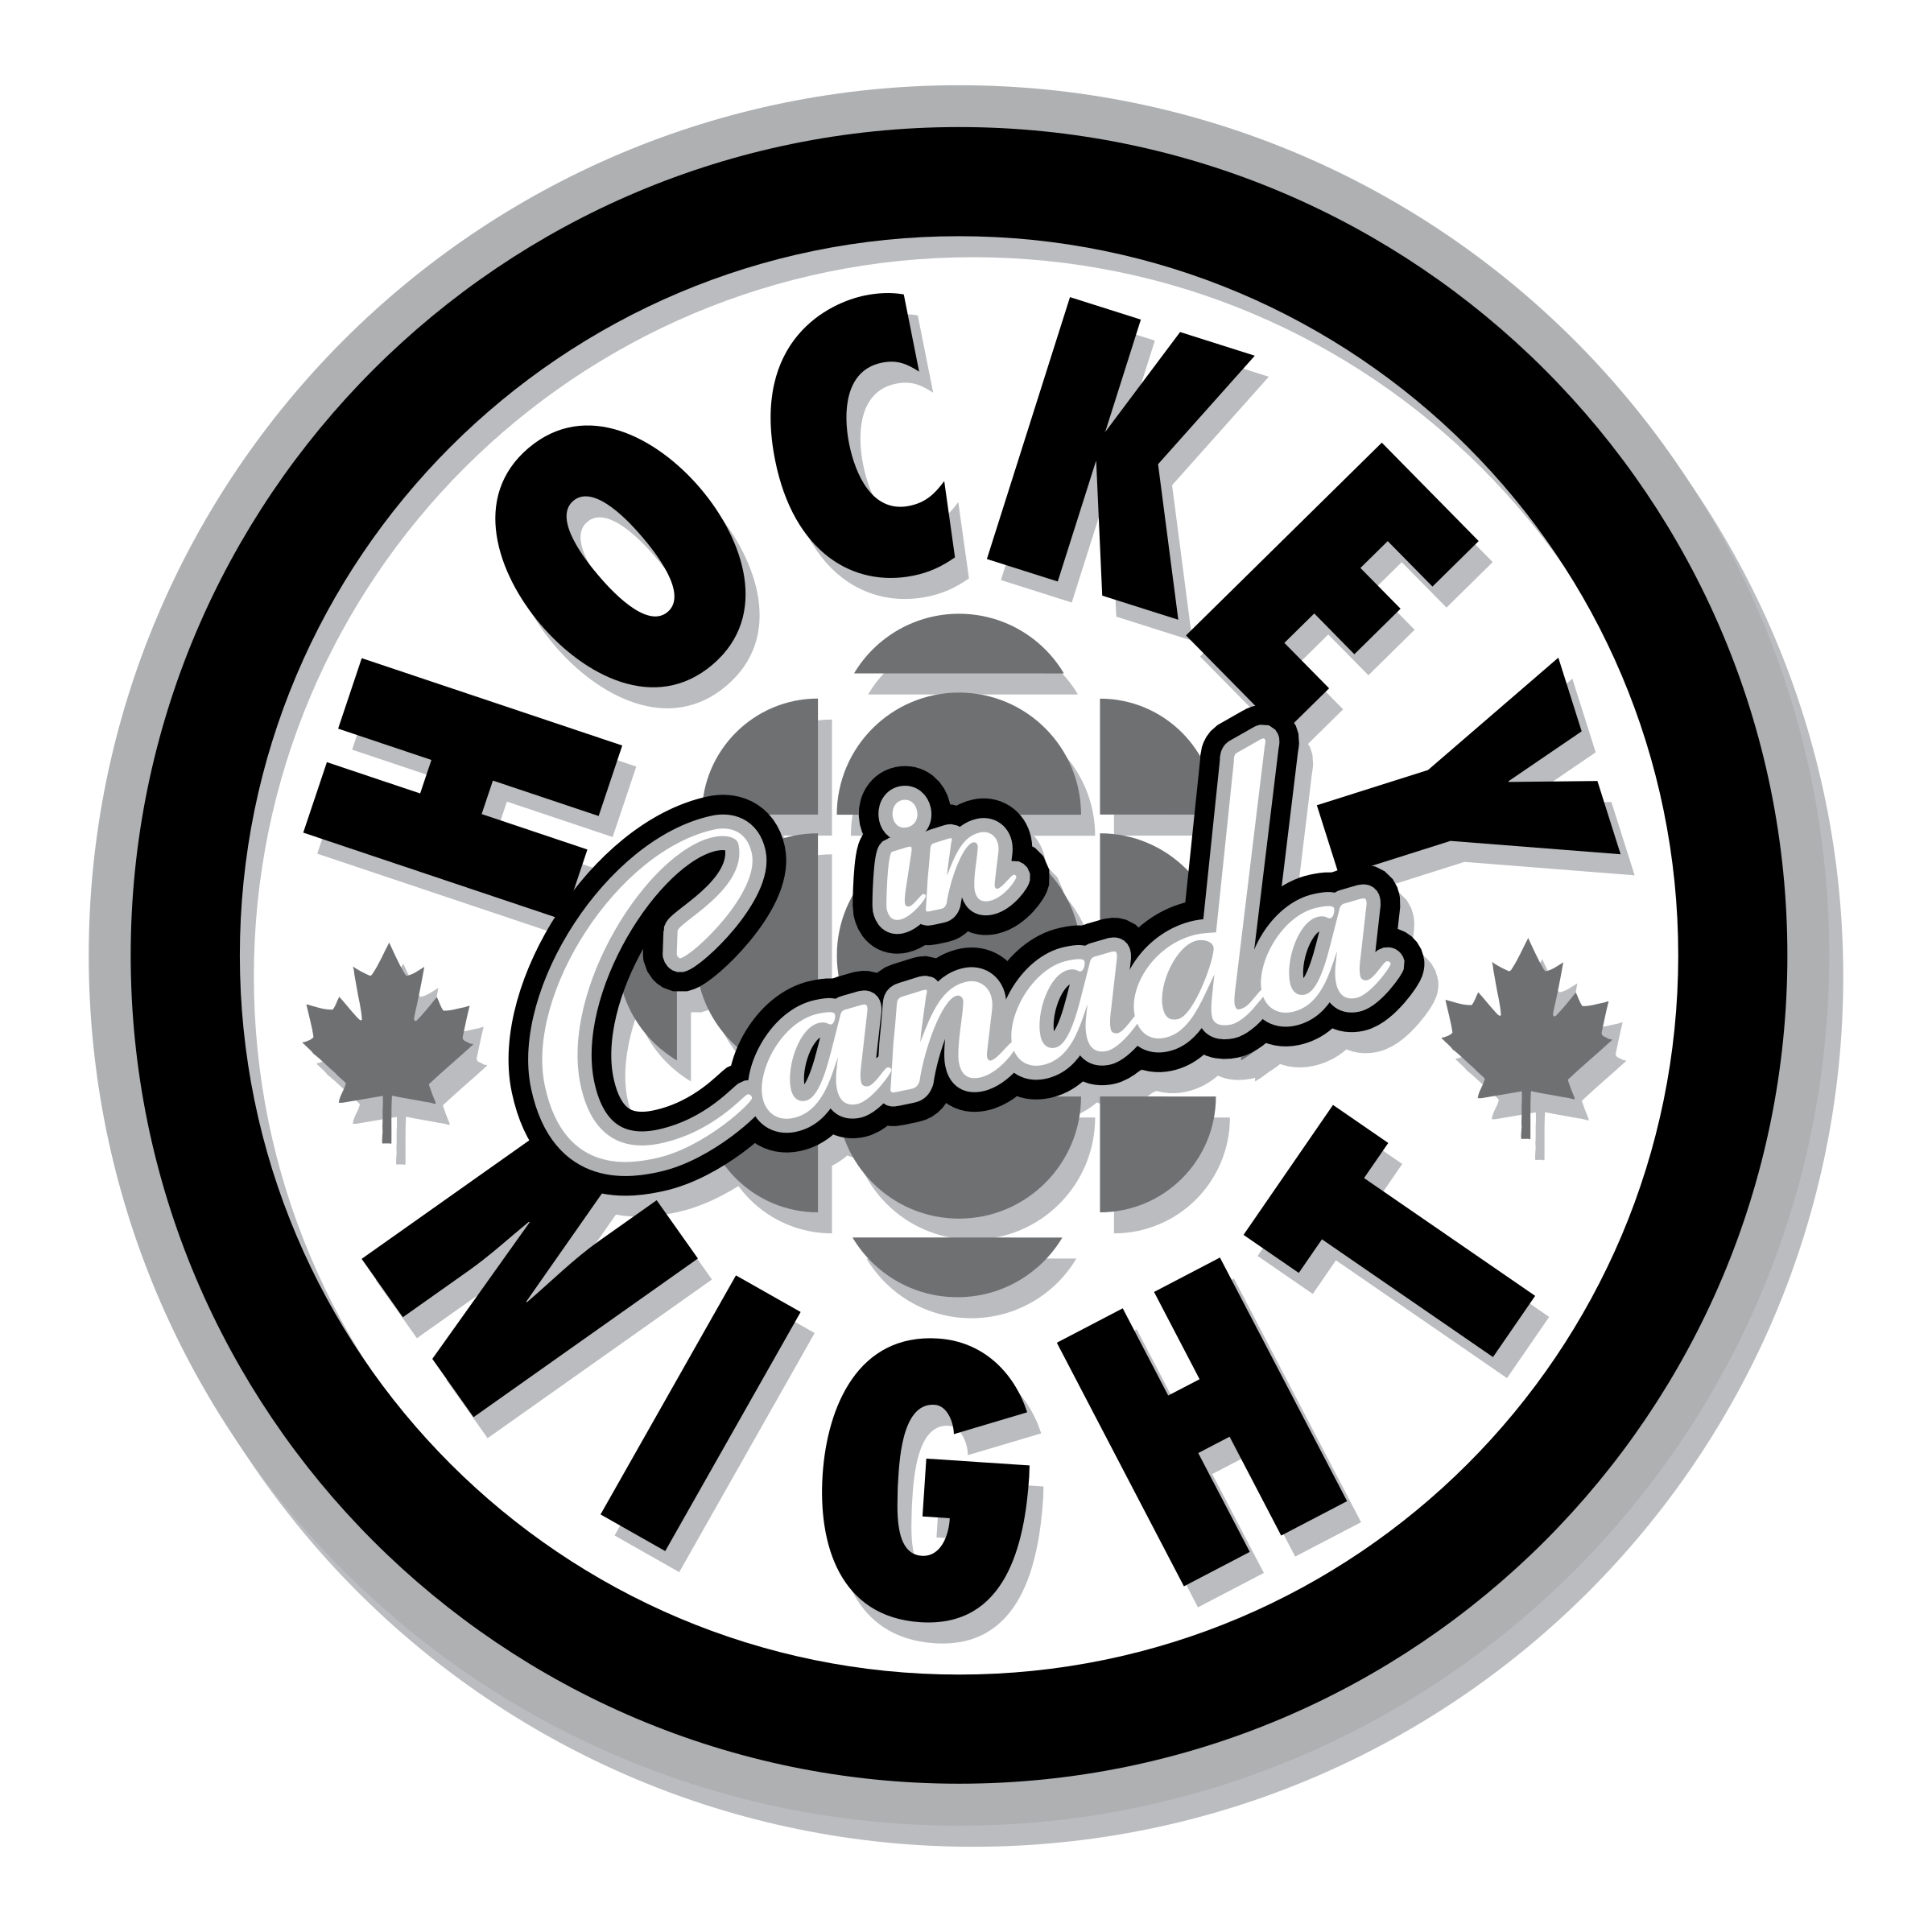 Night in logo png. Hockey clipart hockey canada